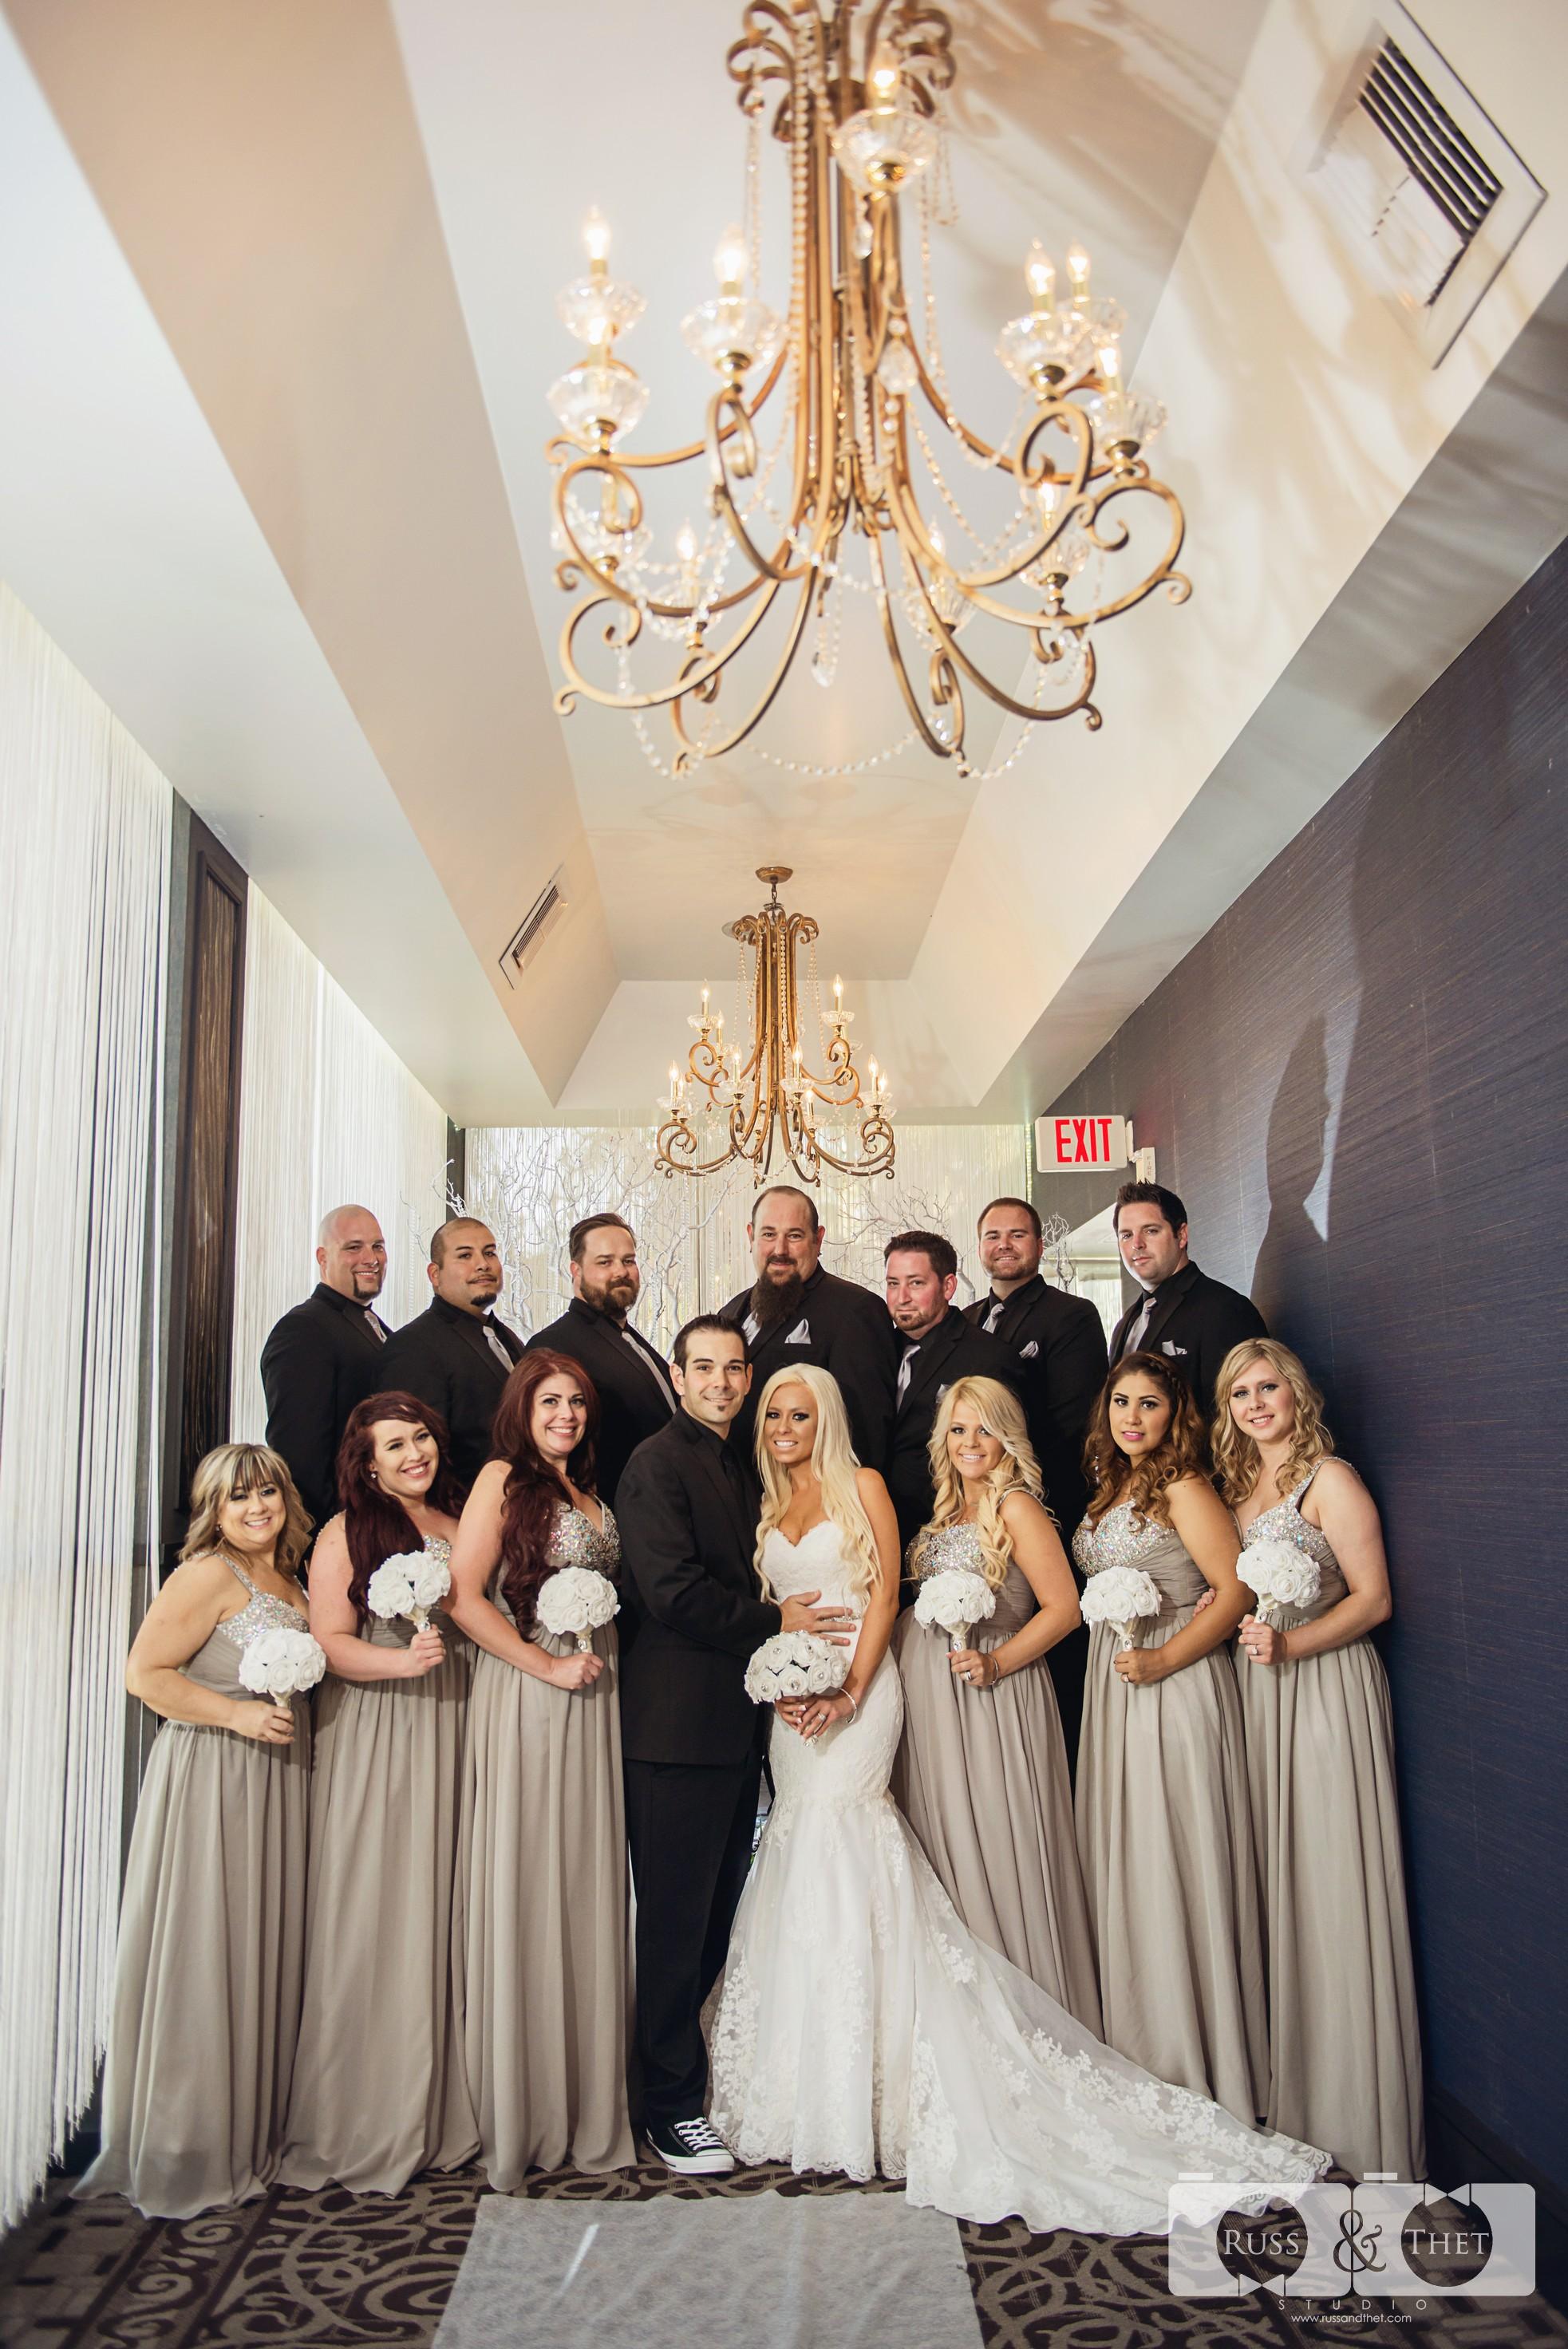 Jon&Kimee-The-Hills-Hotel-Wedding-Photographer (60).jpg